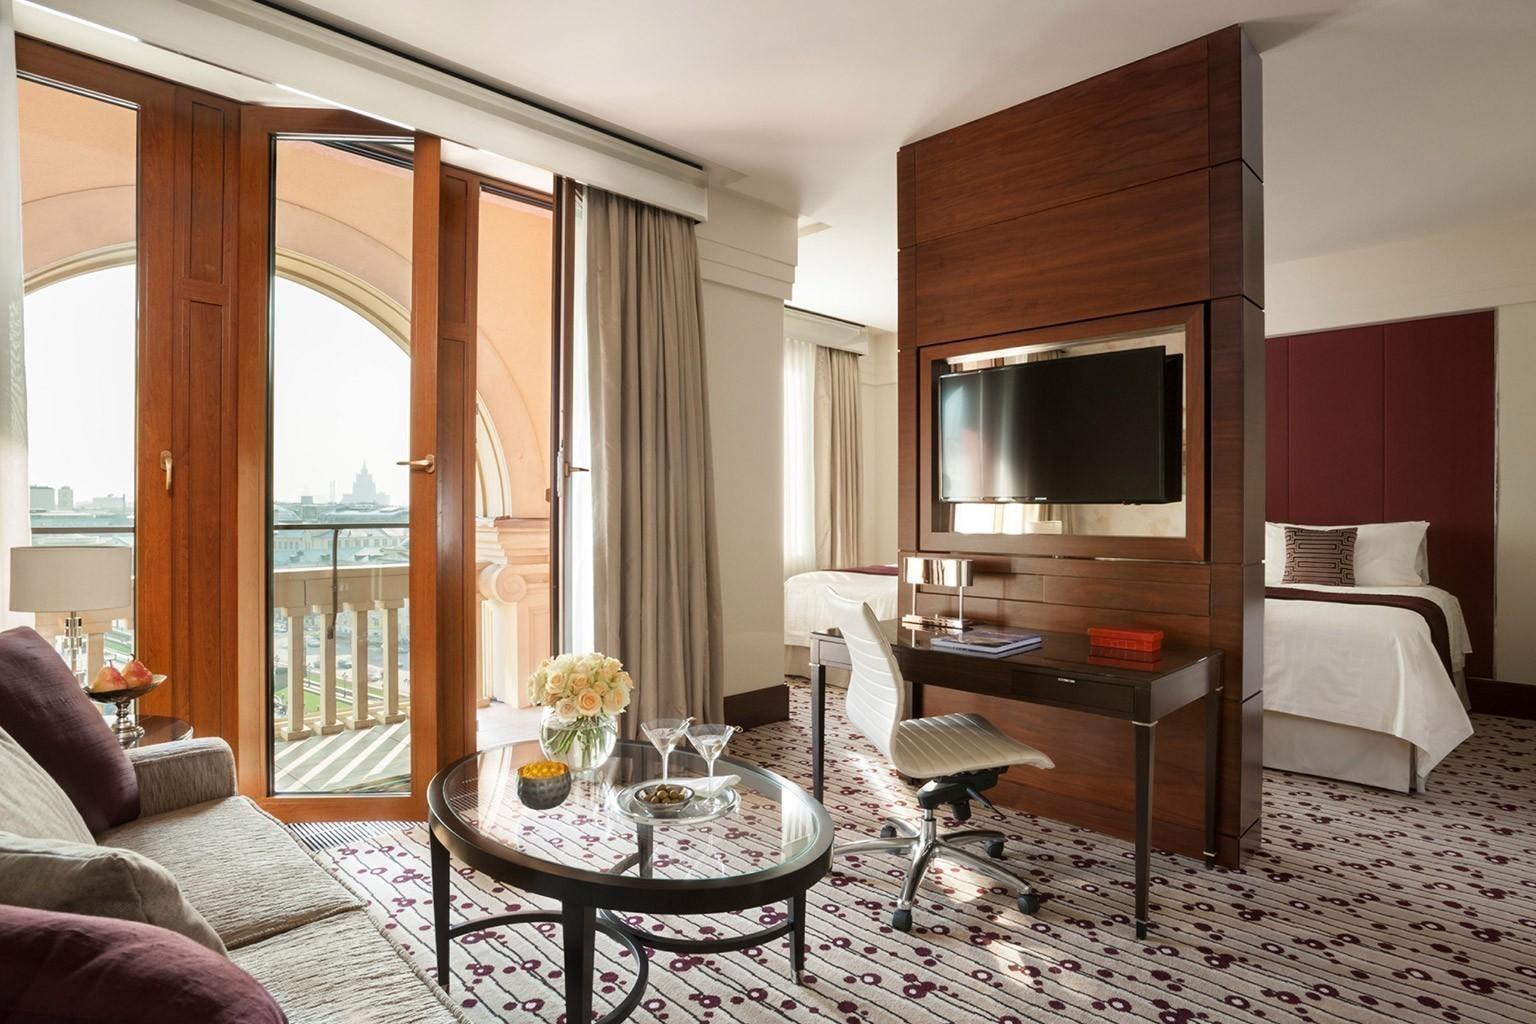 Four seasons hotel moskau luxushotel designreisen for Design hotel mosca